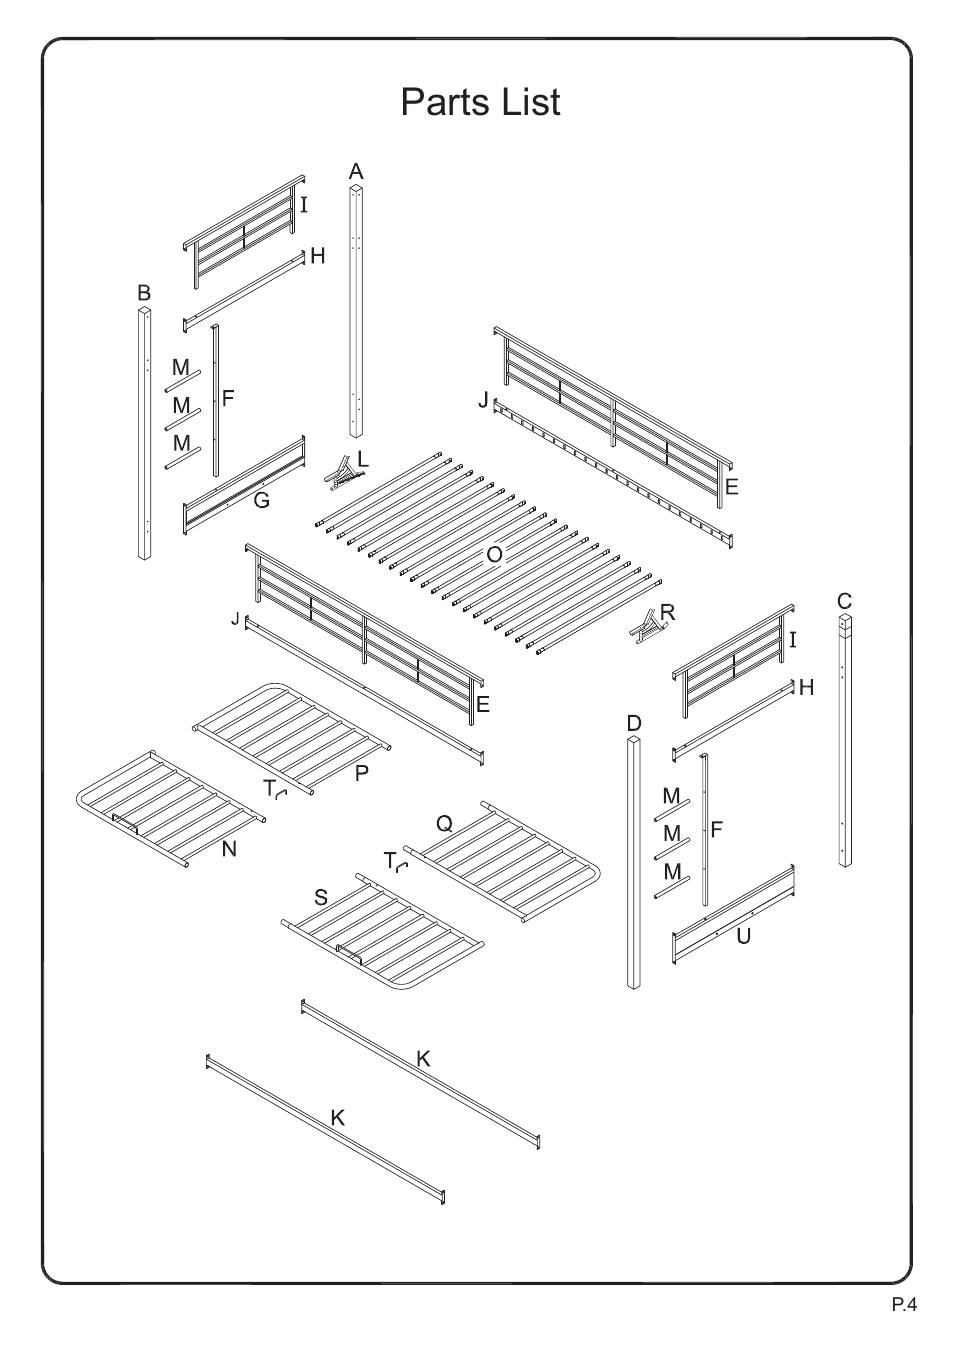 Parts List Walker Edison Furniture Btof Sunrise Twin Futon Metal